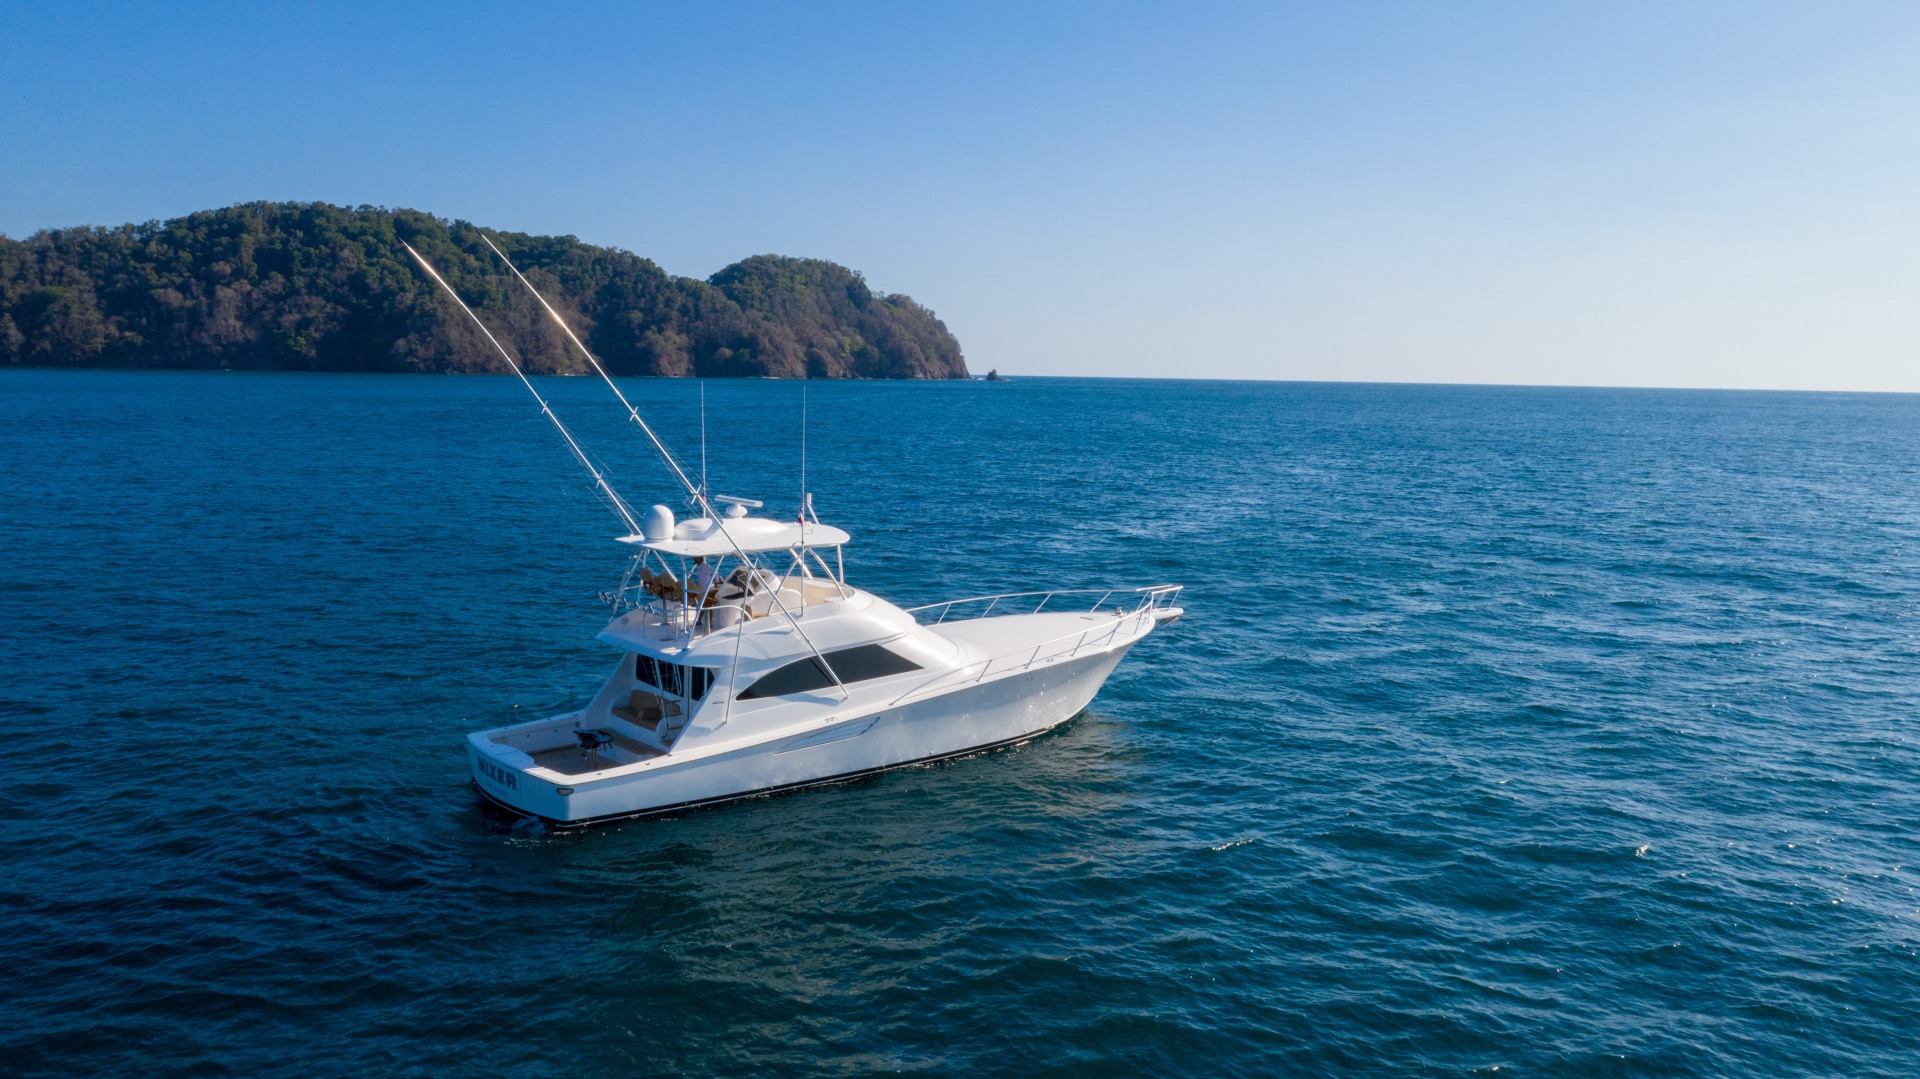 Viking-62 Convertible 2014-Mixer Playa Herradura, Los Suenos,-Costa Rica-2014 Viking 62 Convertible  Starboard Profile-1356276 | Thumbnail